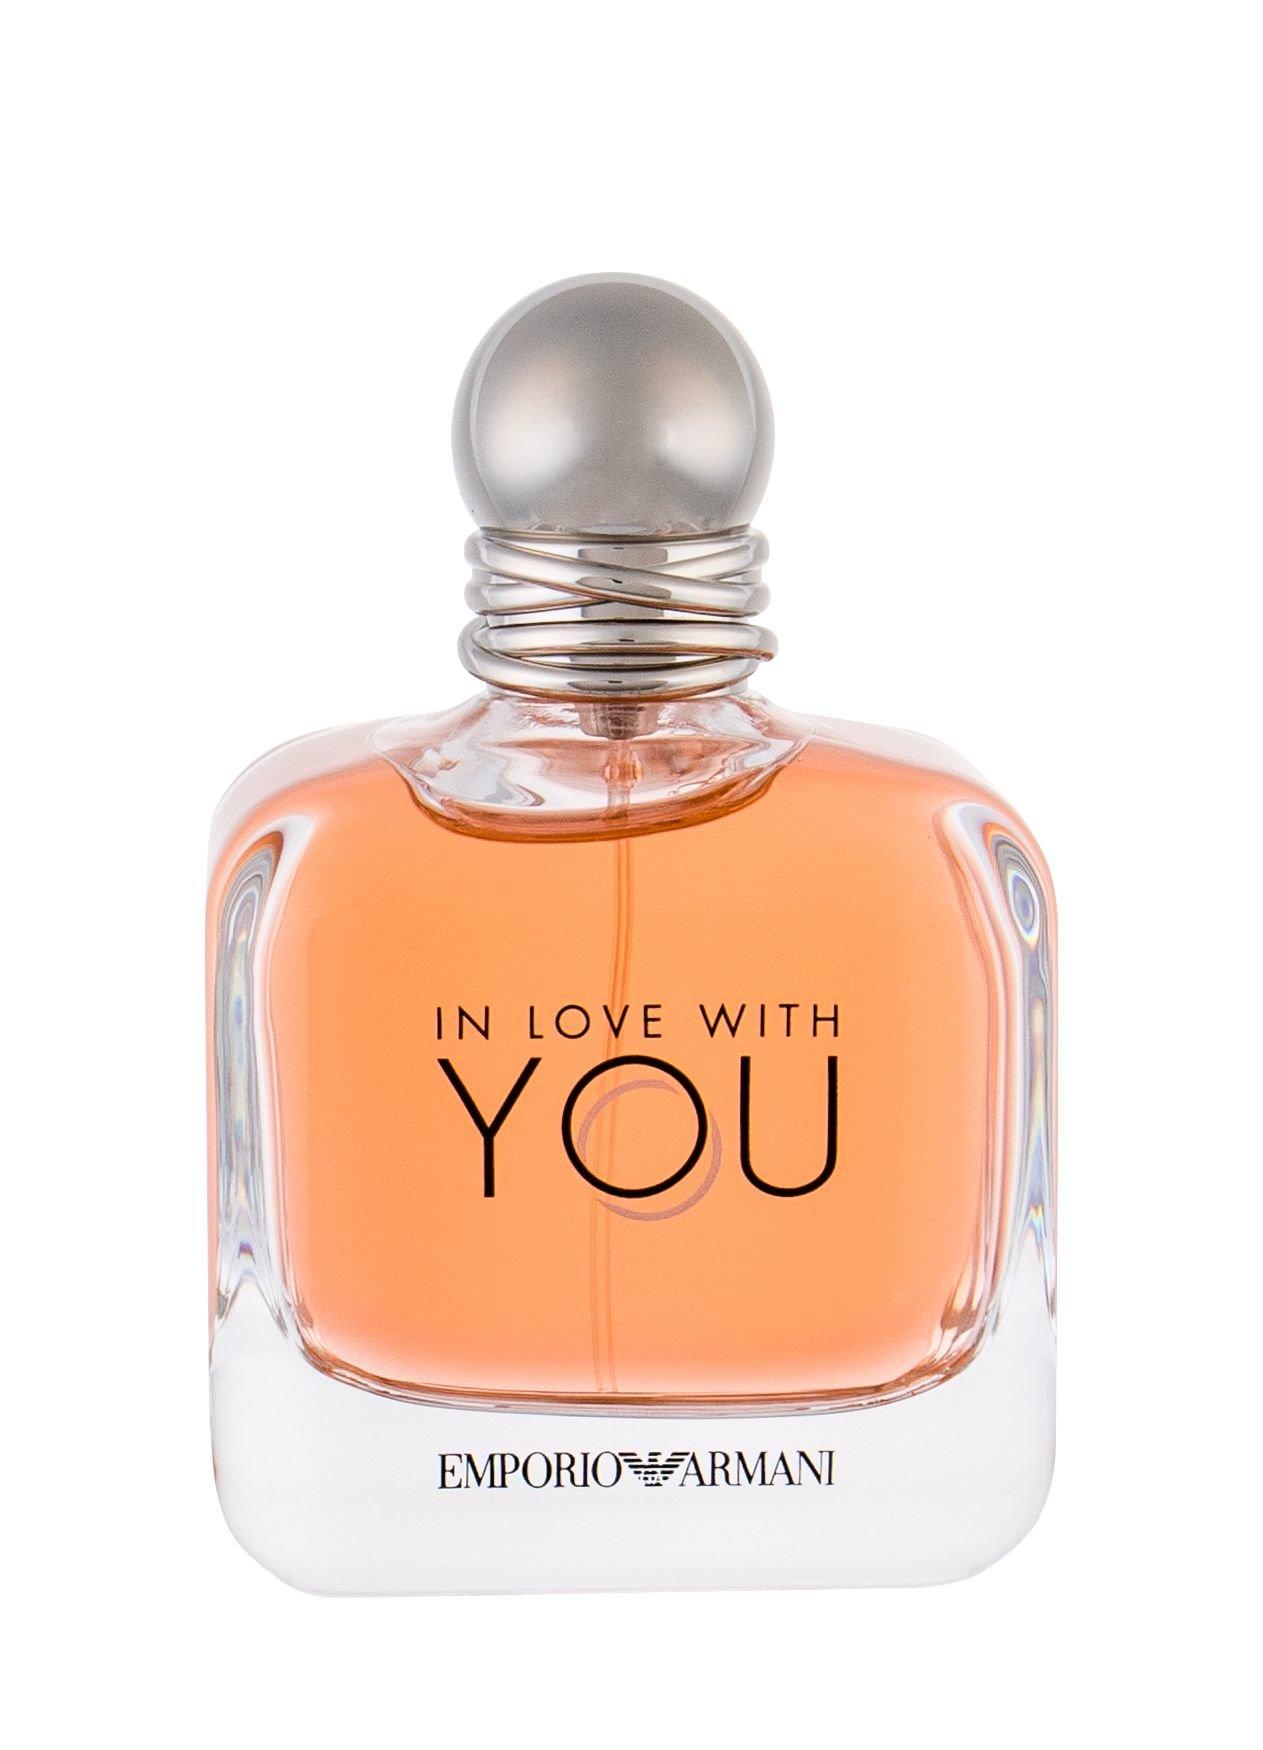 Giorgio Armani Emporio Armani Eau de Parfum 100ml  In Love With You